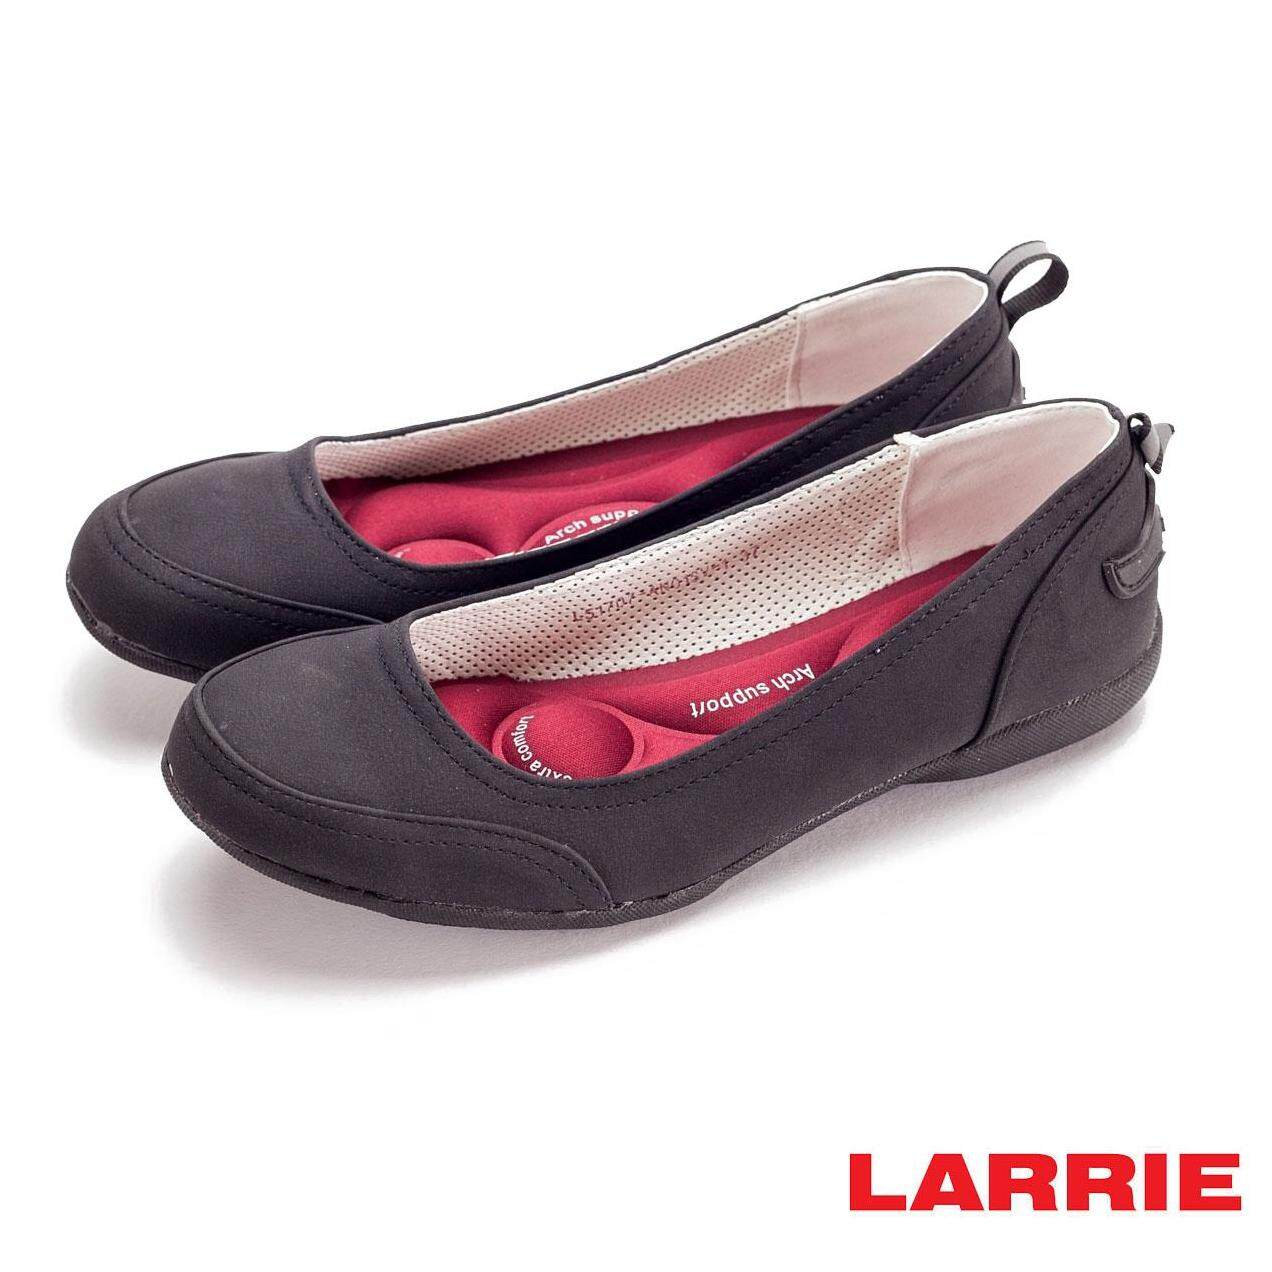 5bc983fd76 Flat Shoes - Buy Womens Flat Shoes, Pumps, Ballet Flats Online ...